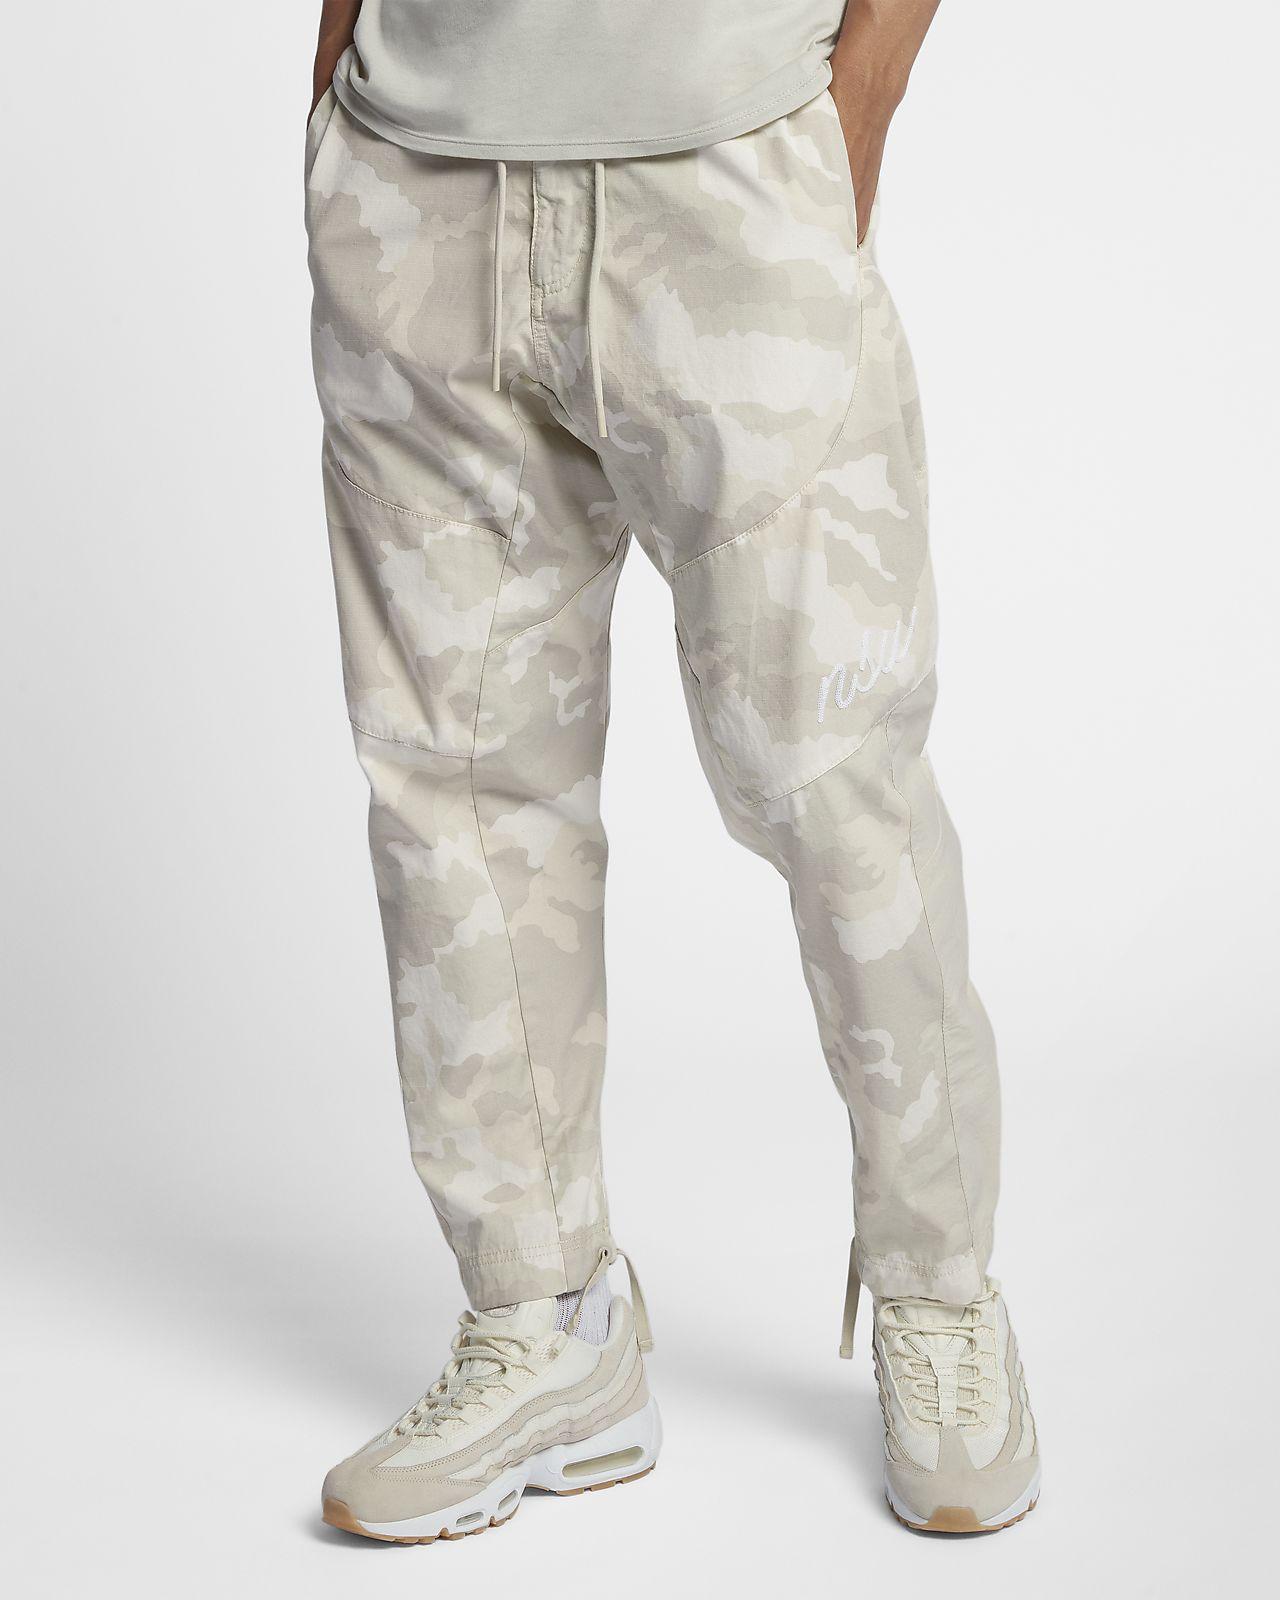 e5178a8be7e63d Nike Sportswear NSW Men s Woven Camo Joggers. Nike.com GB